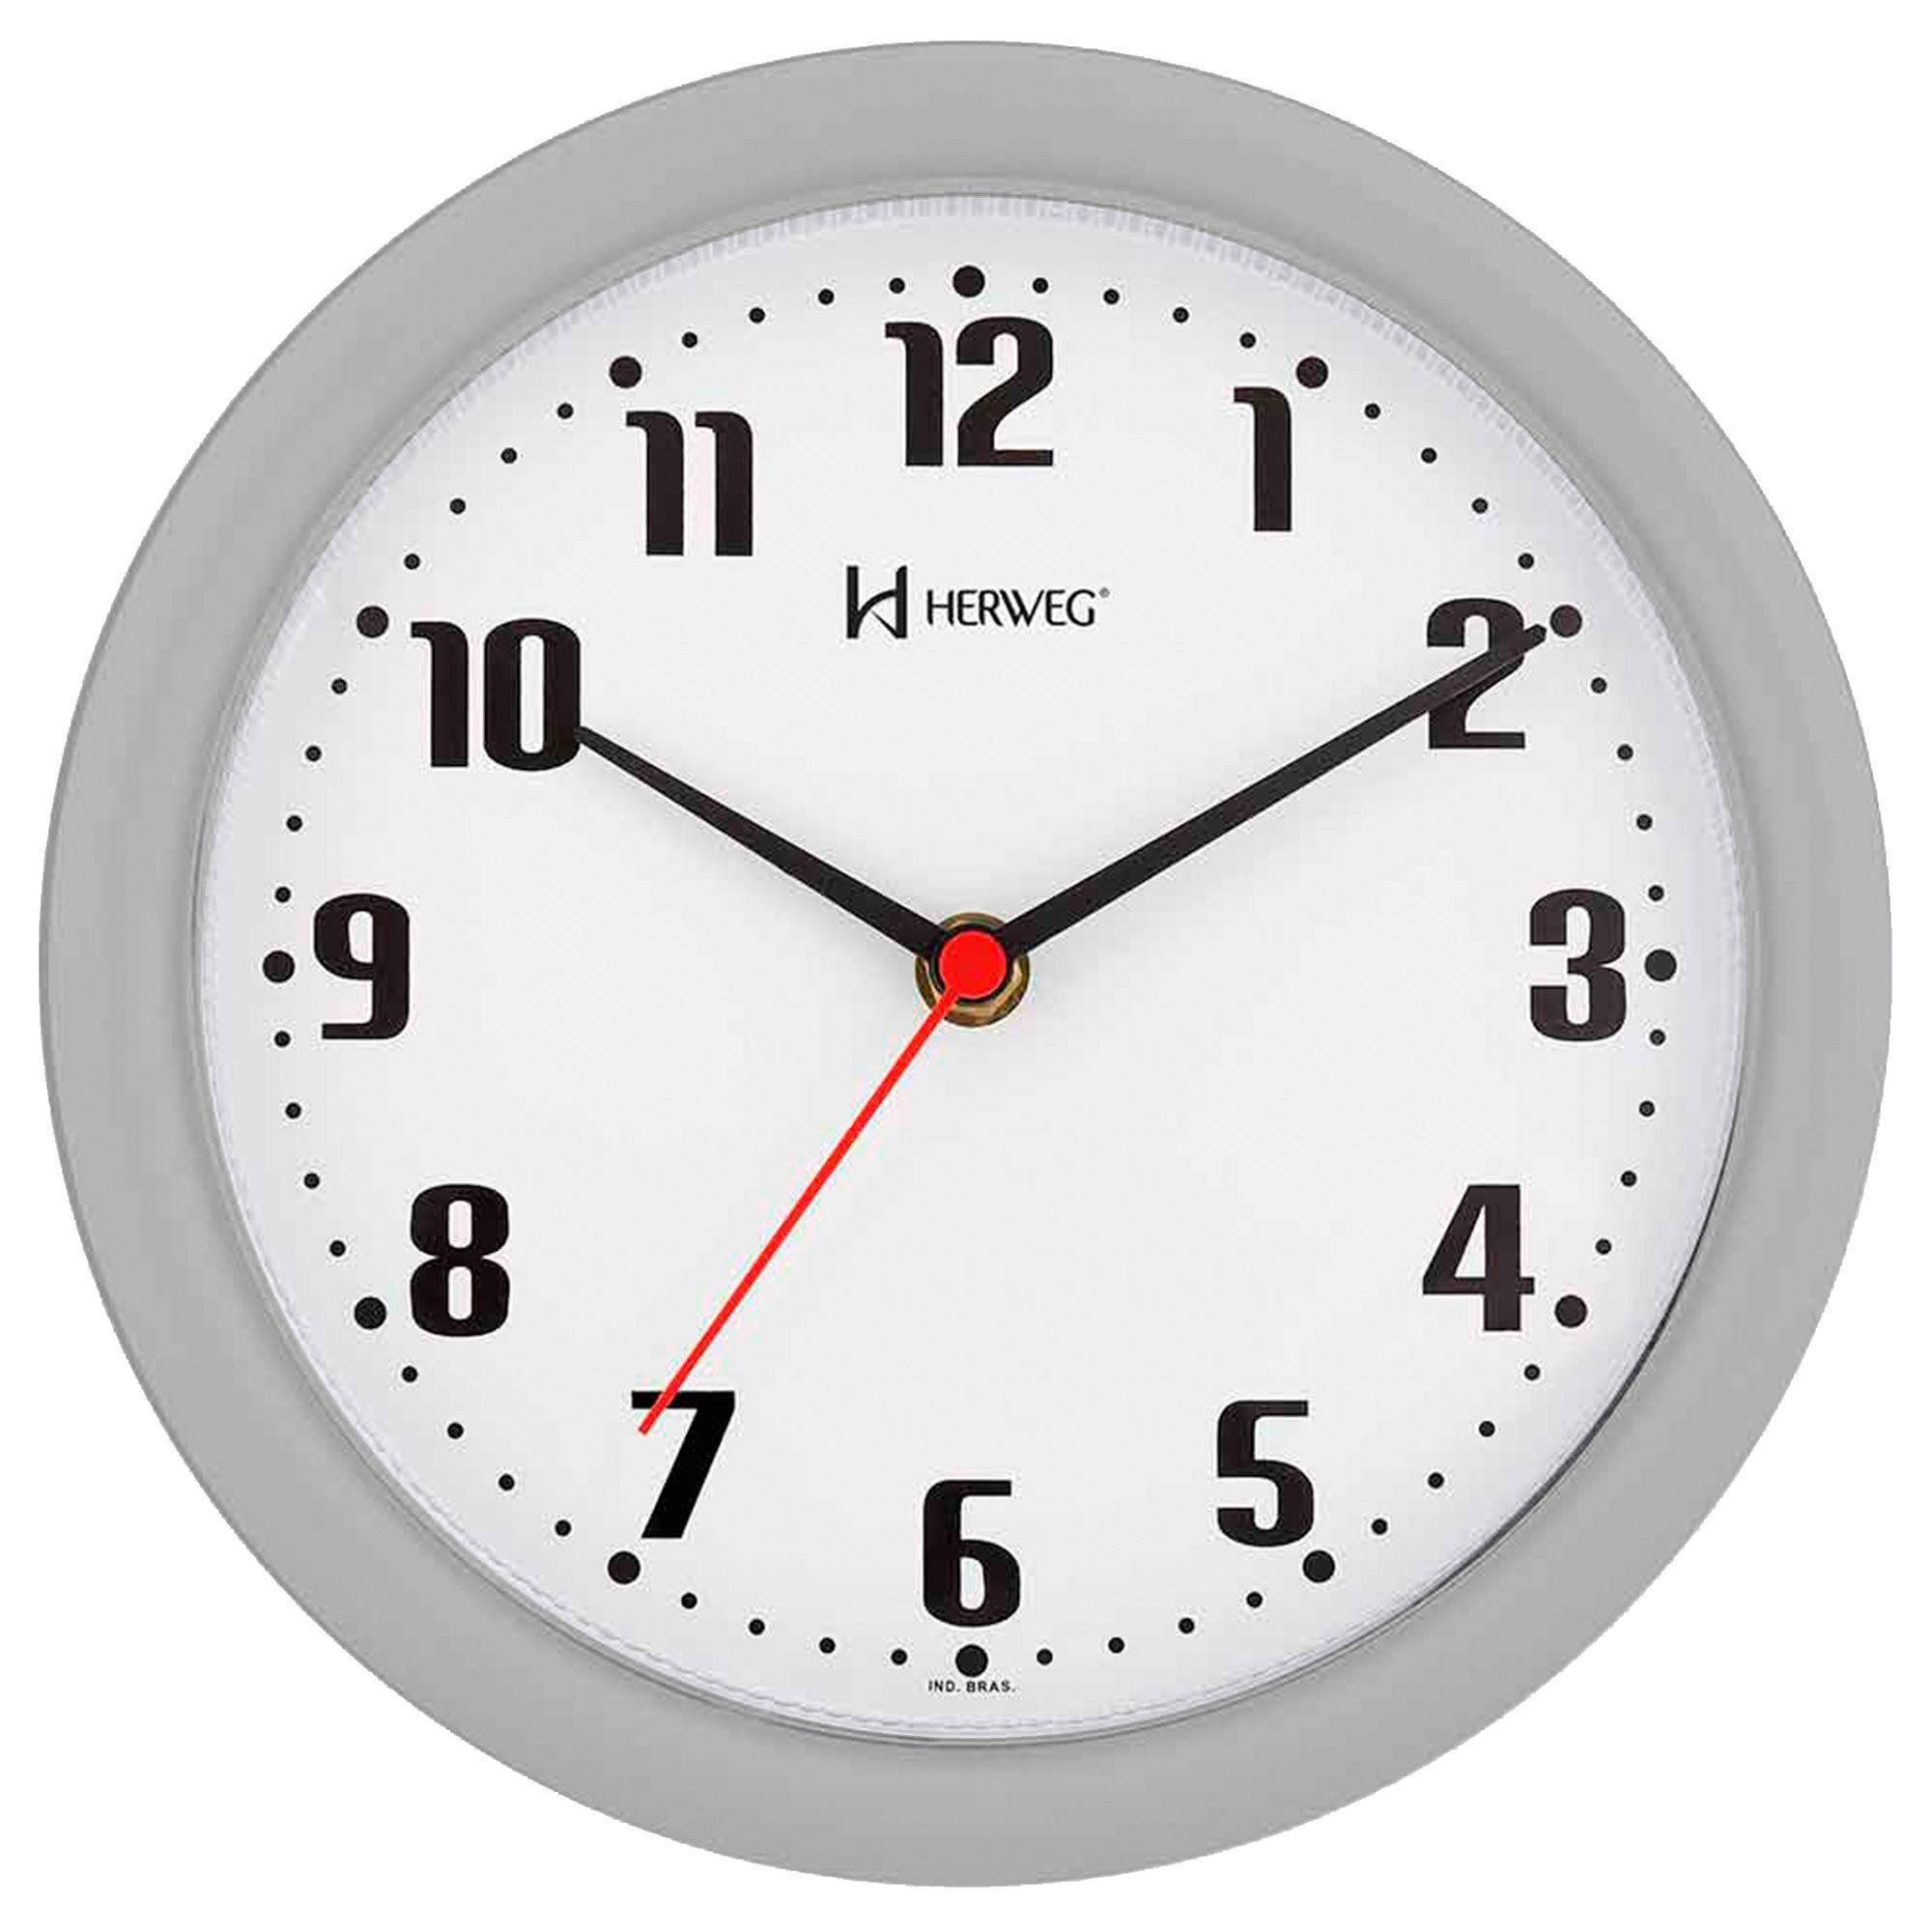 Relógio de Parede Analógico Herweg 6102 024 Cinza